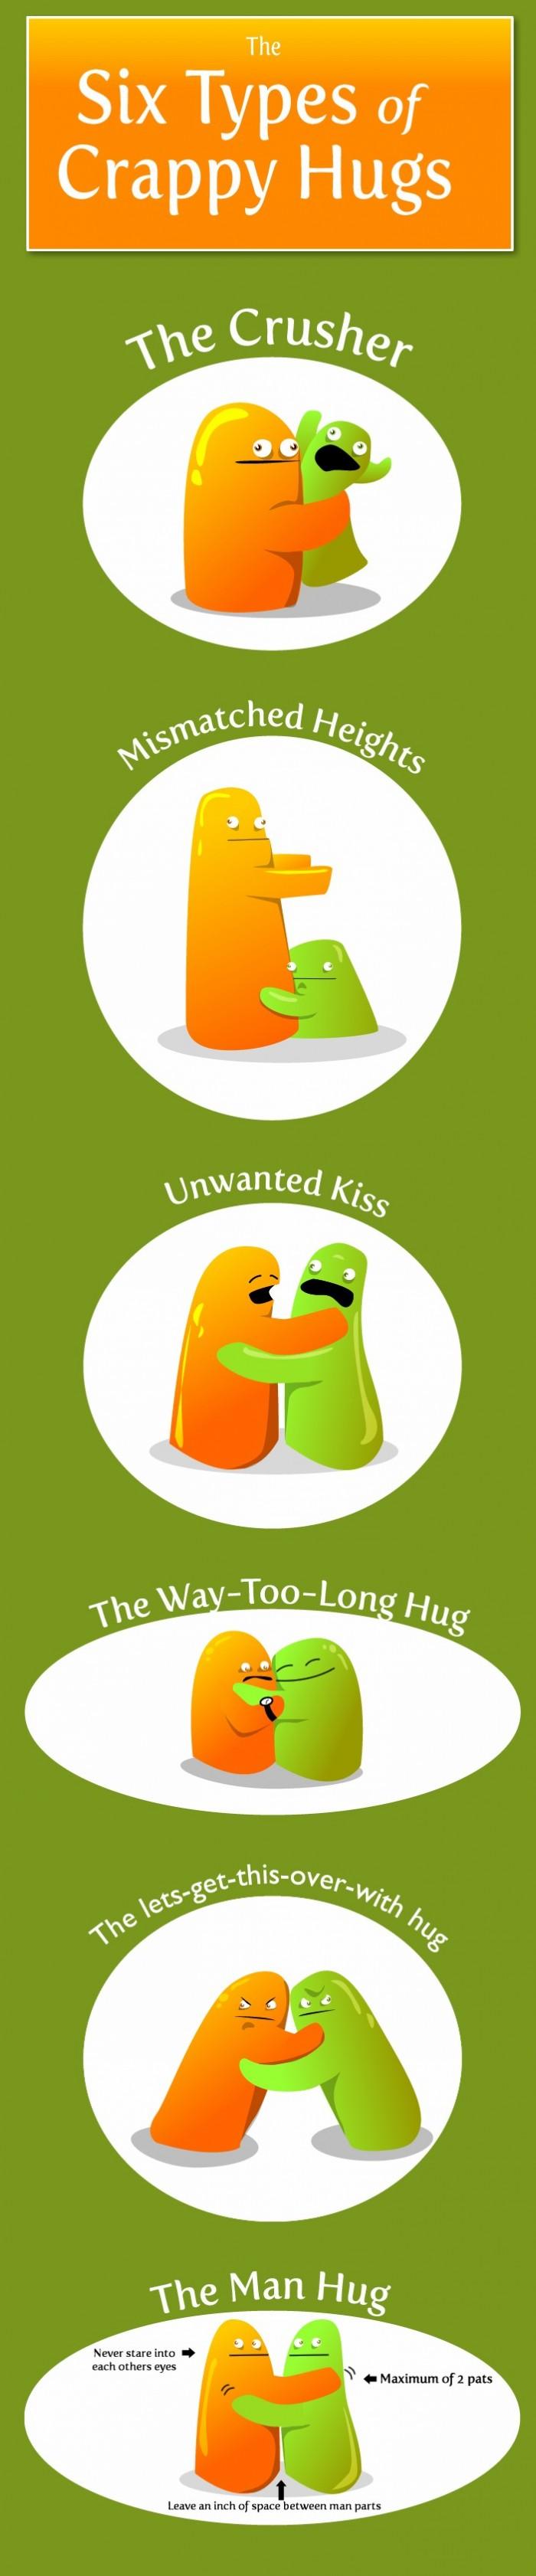 hug.jpg (222 KB)